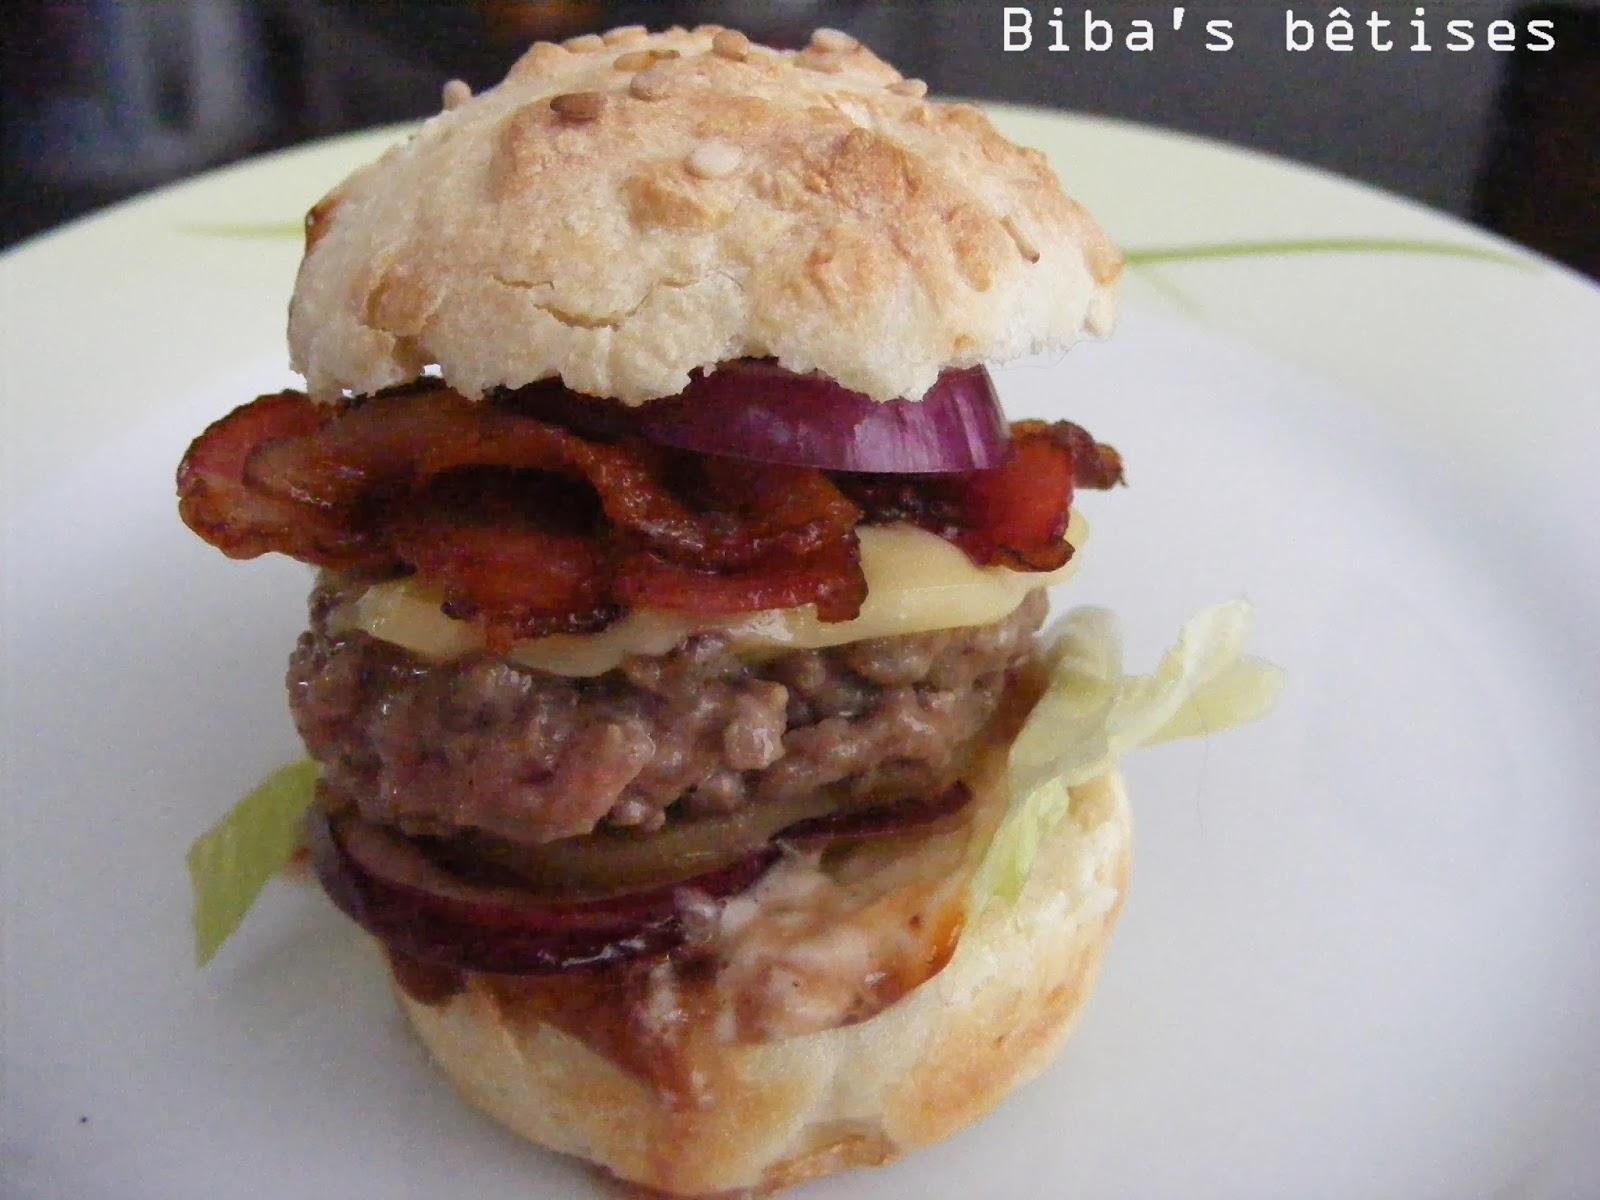 bibas b tises rezept mini burger und br tchen. Black Bedroom Furniture Sets. Home Design Ideas